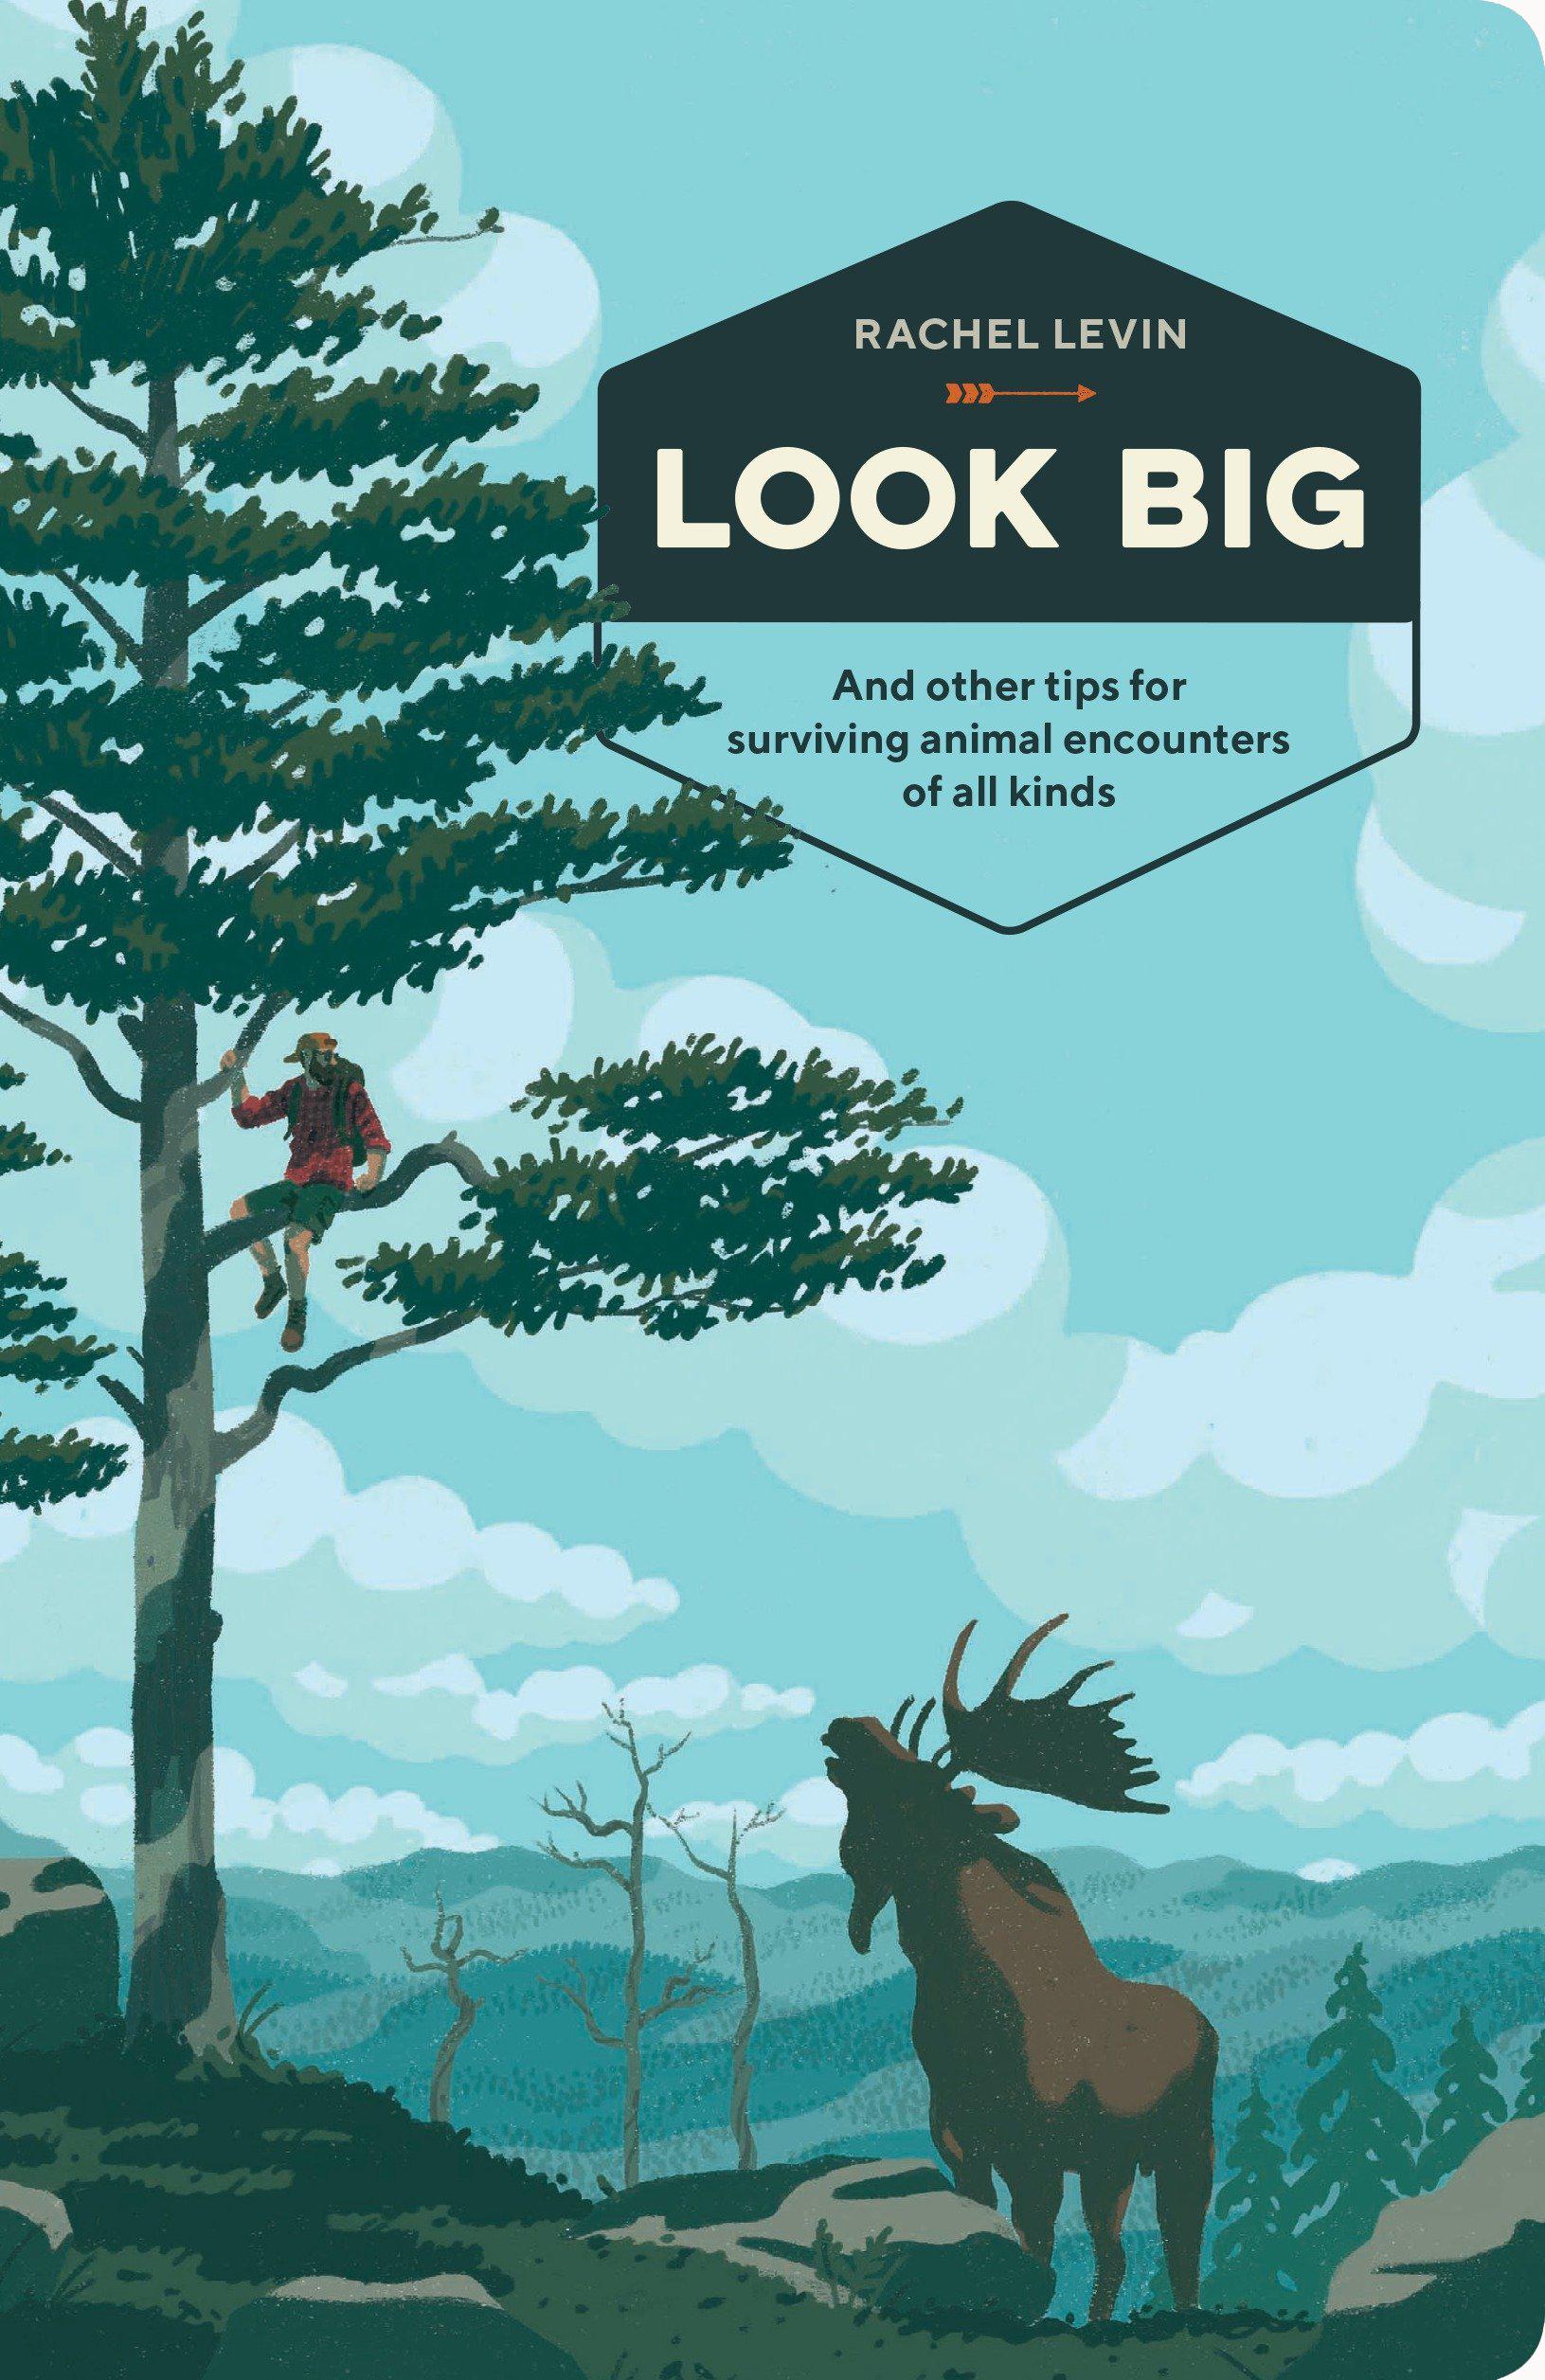 Illustrations for Look Big, Cover Design: Ashley Lima